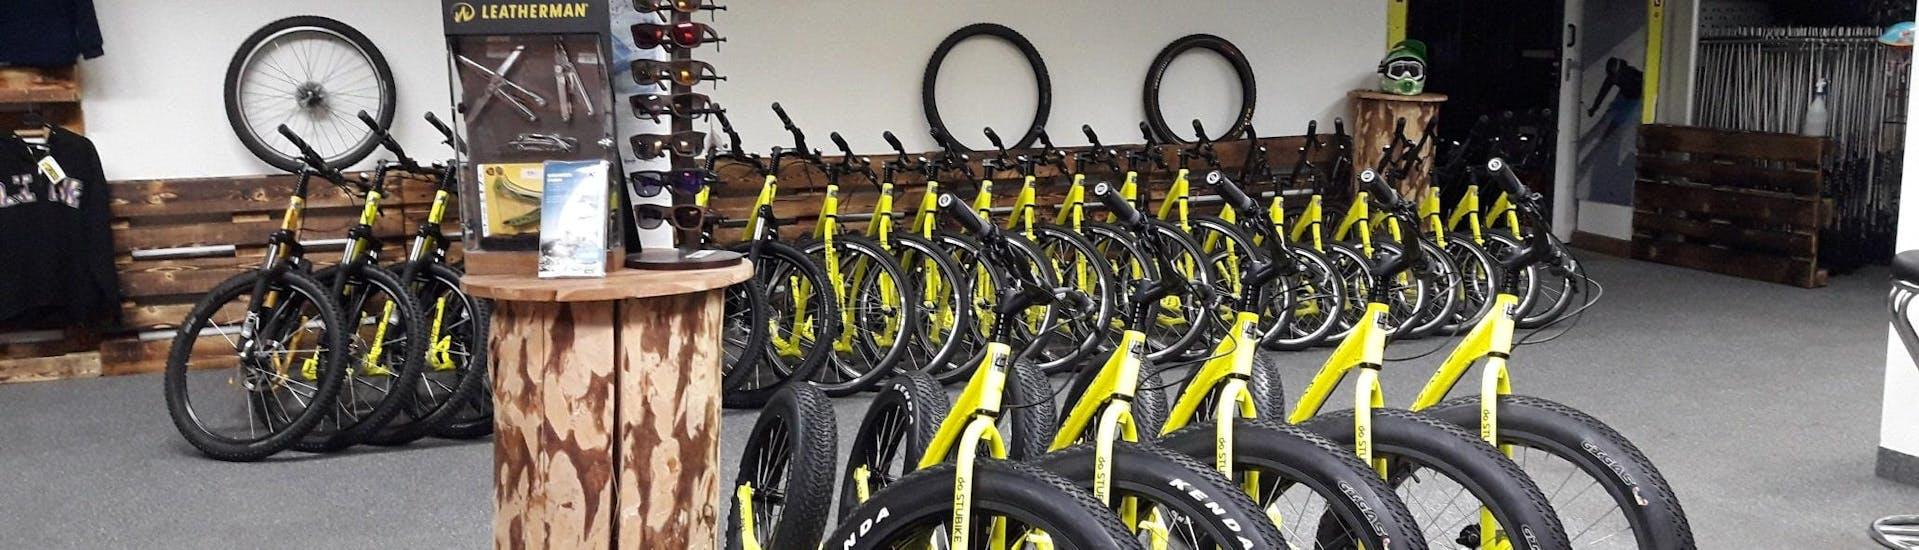 Mountainbike verhuur in Neustift im Stubaital